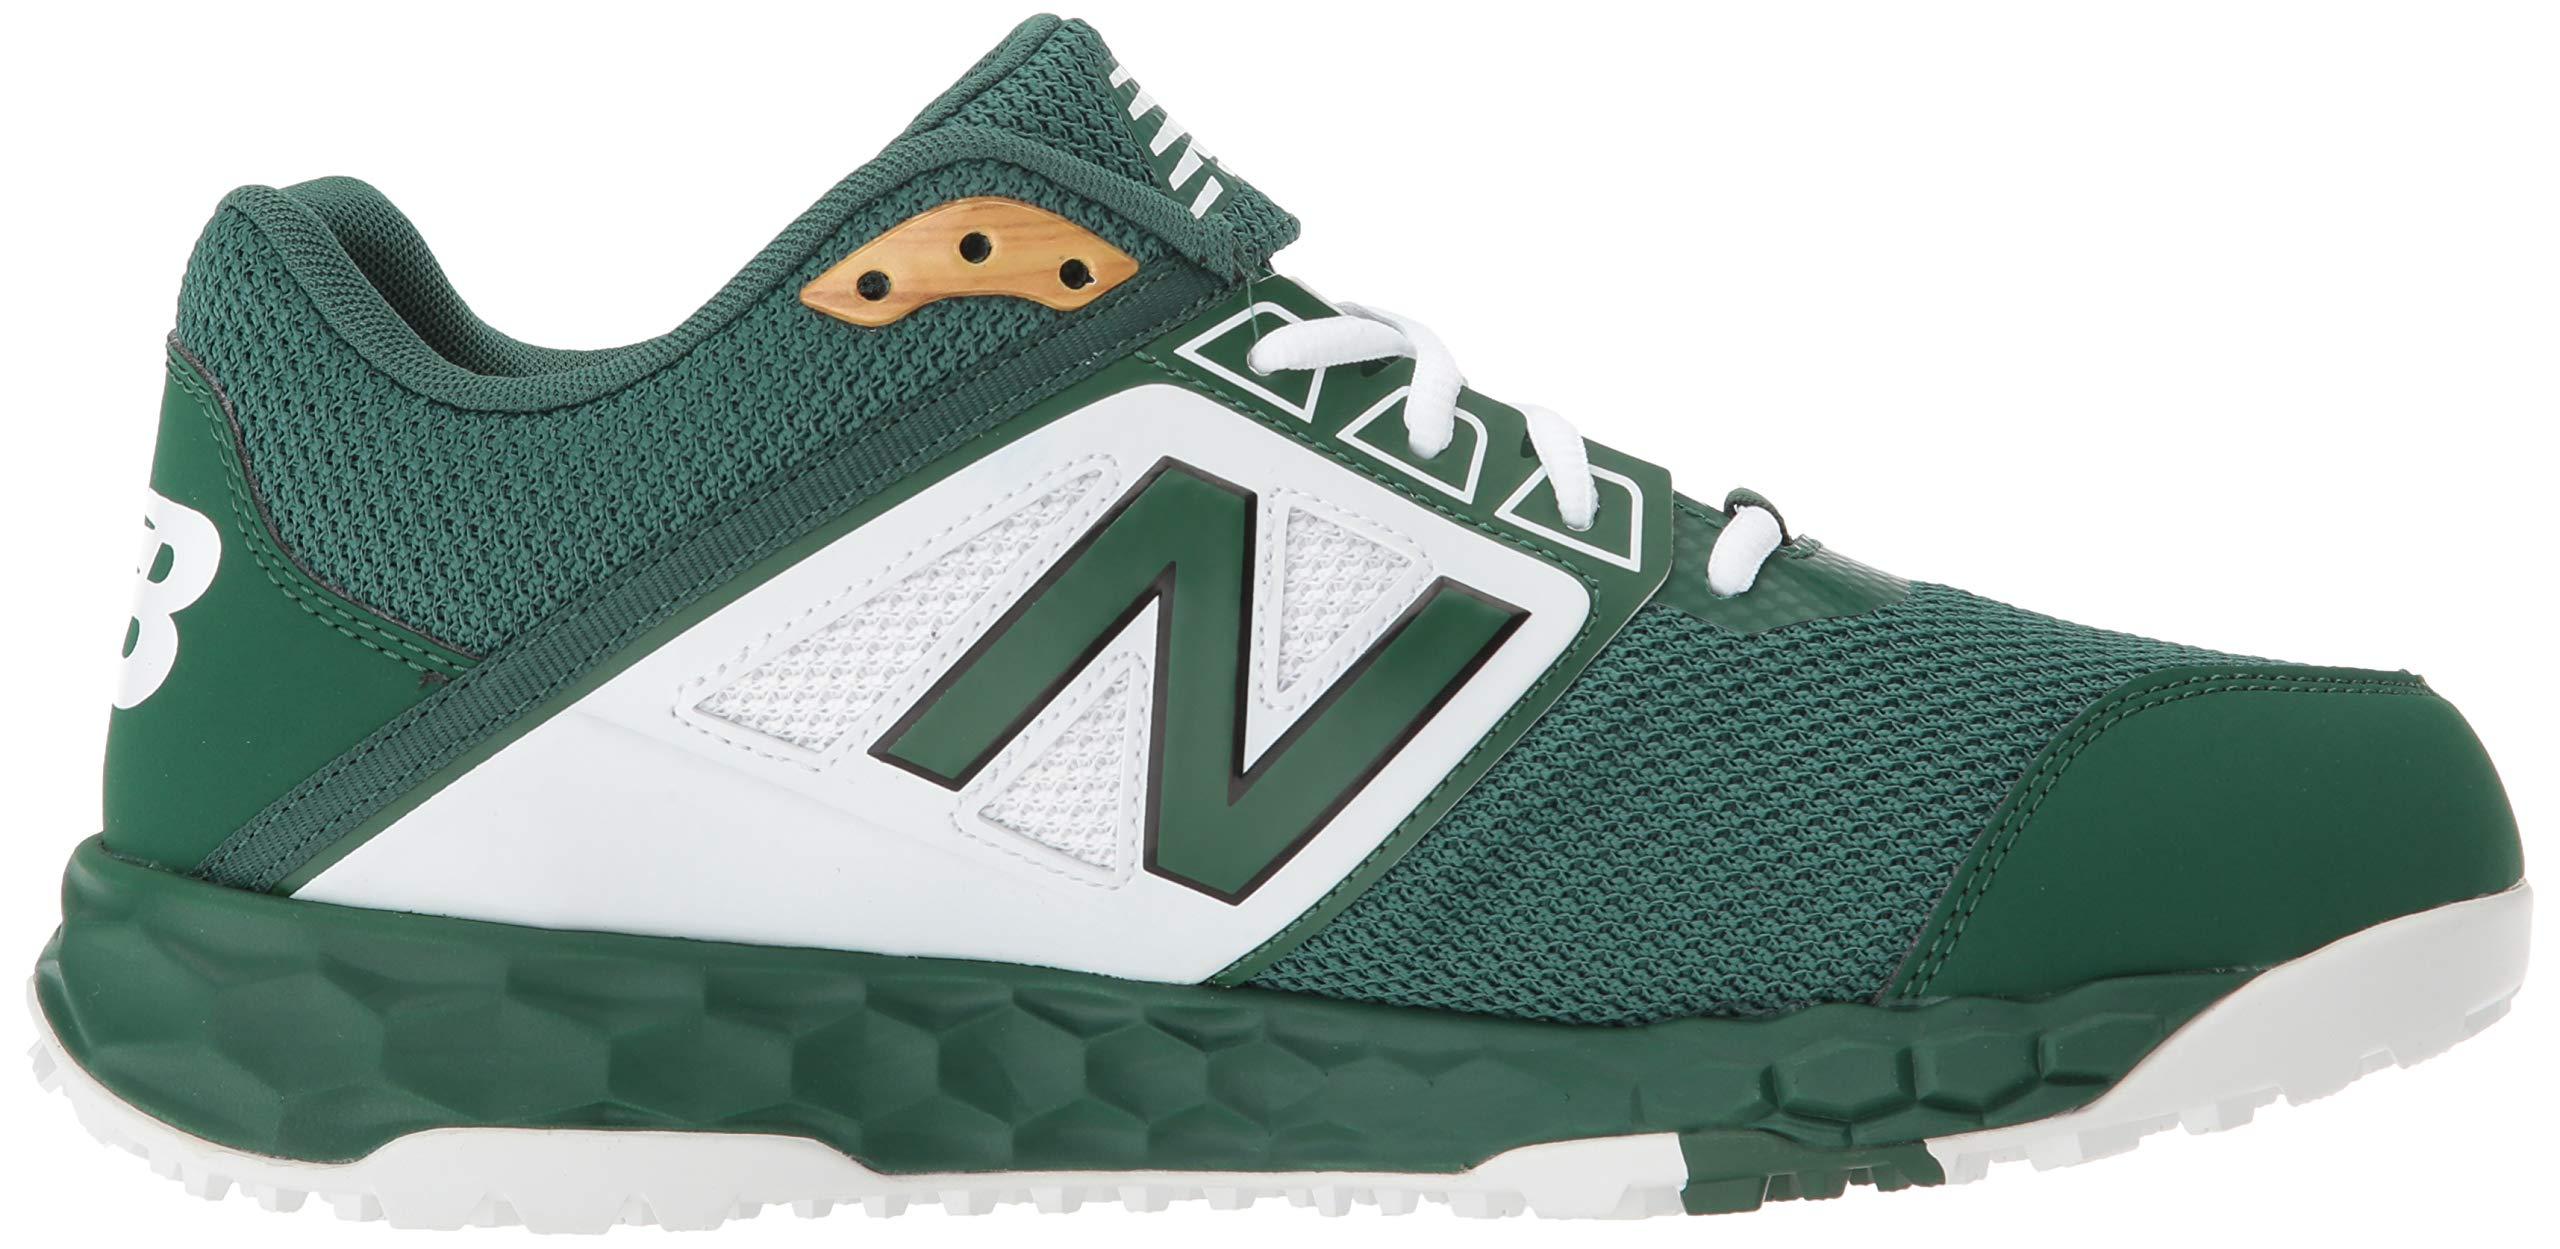 New Balance Men's 3000v4 Turf Baseball Shoe, Green/White, 5 D US by New Balance (Image #7)